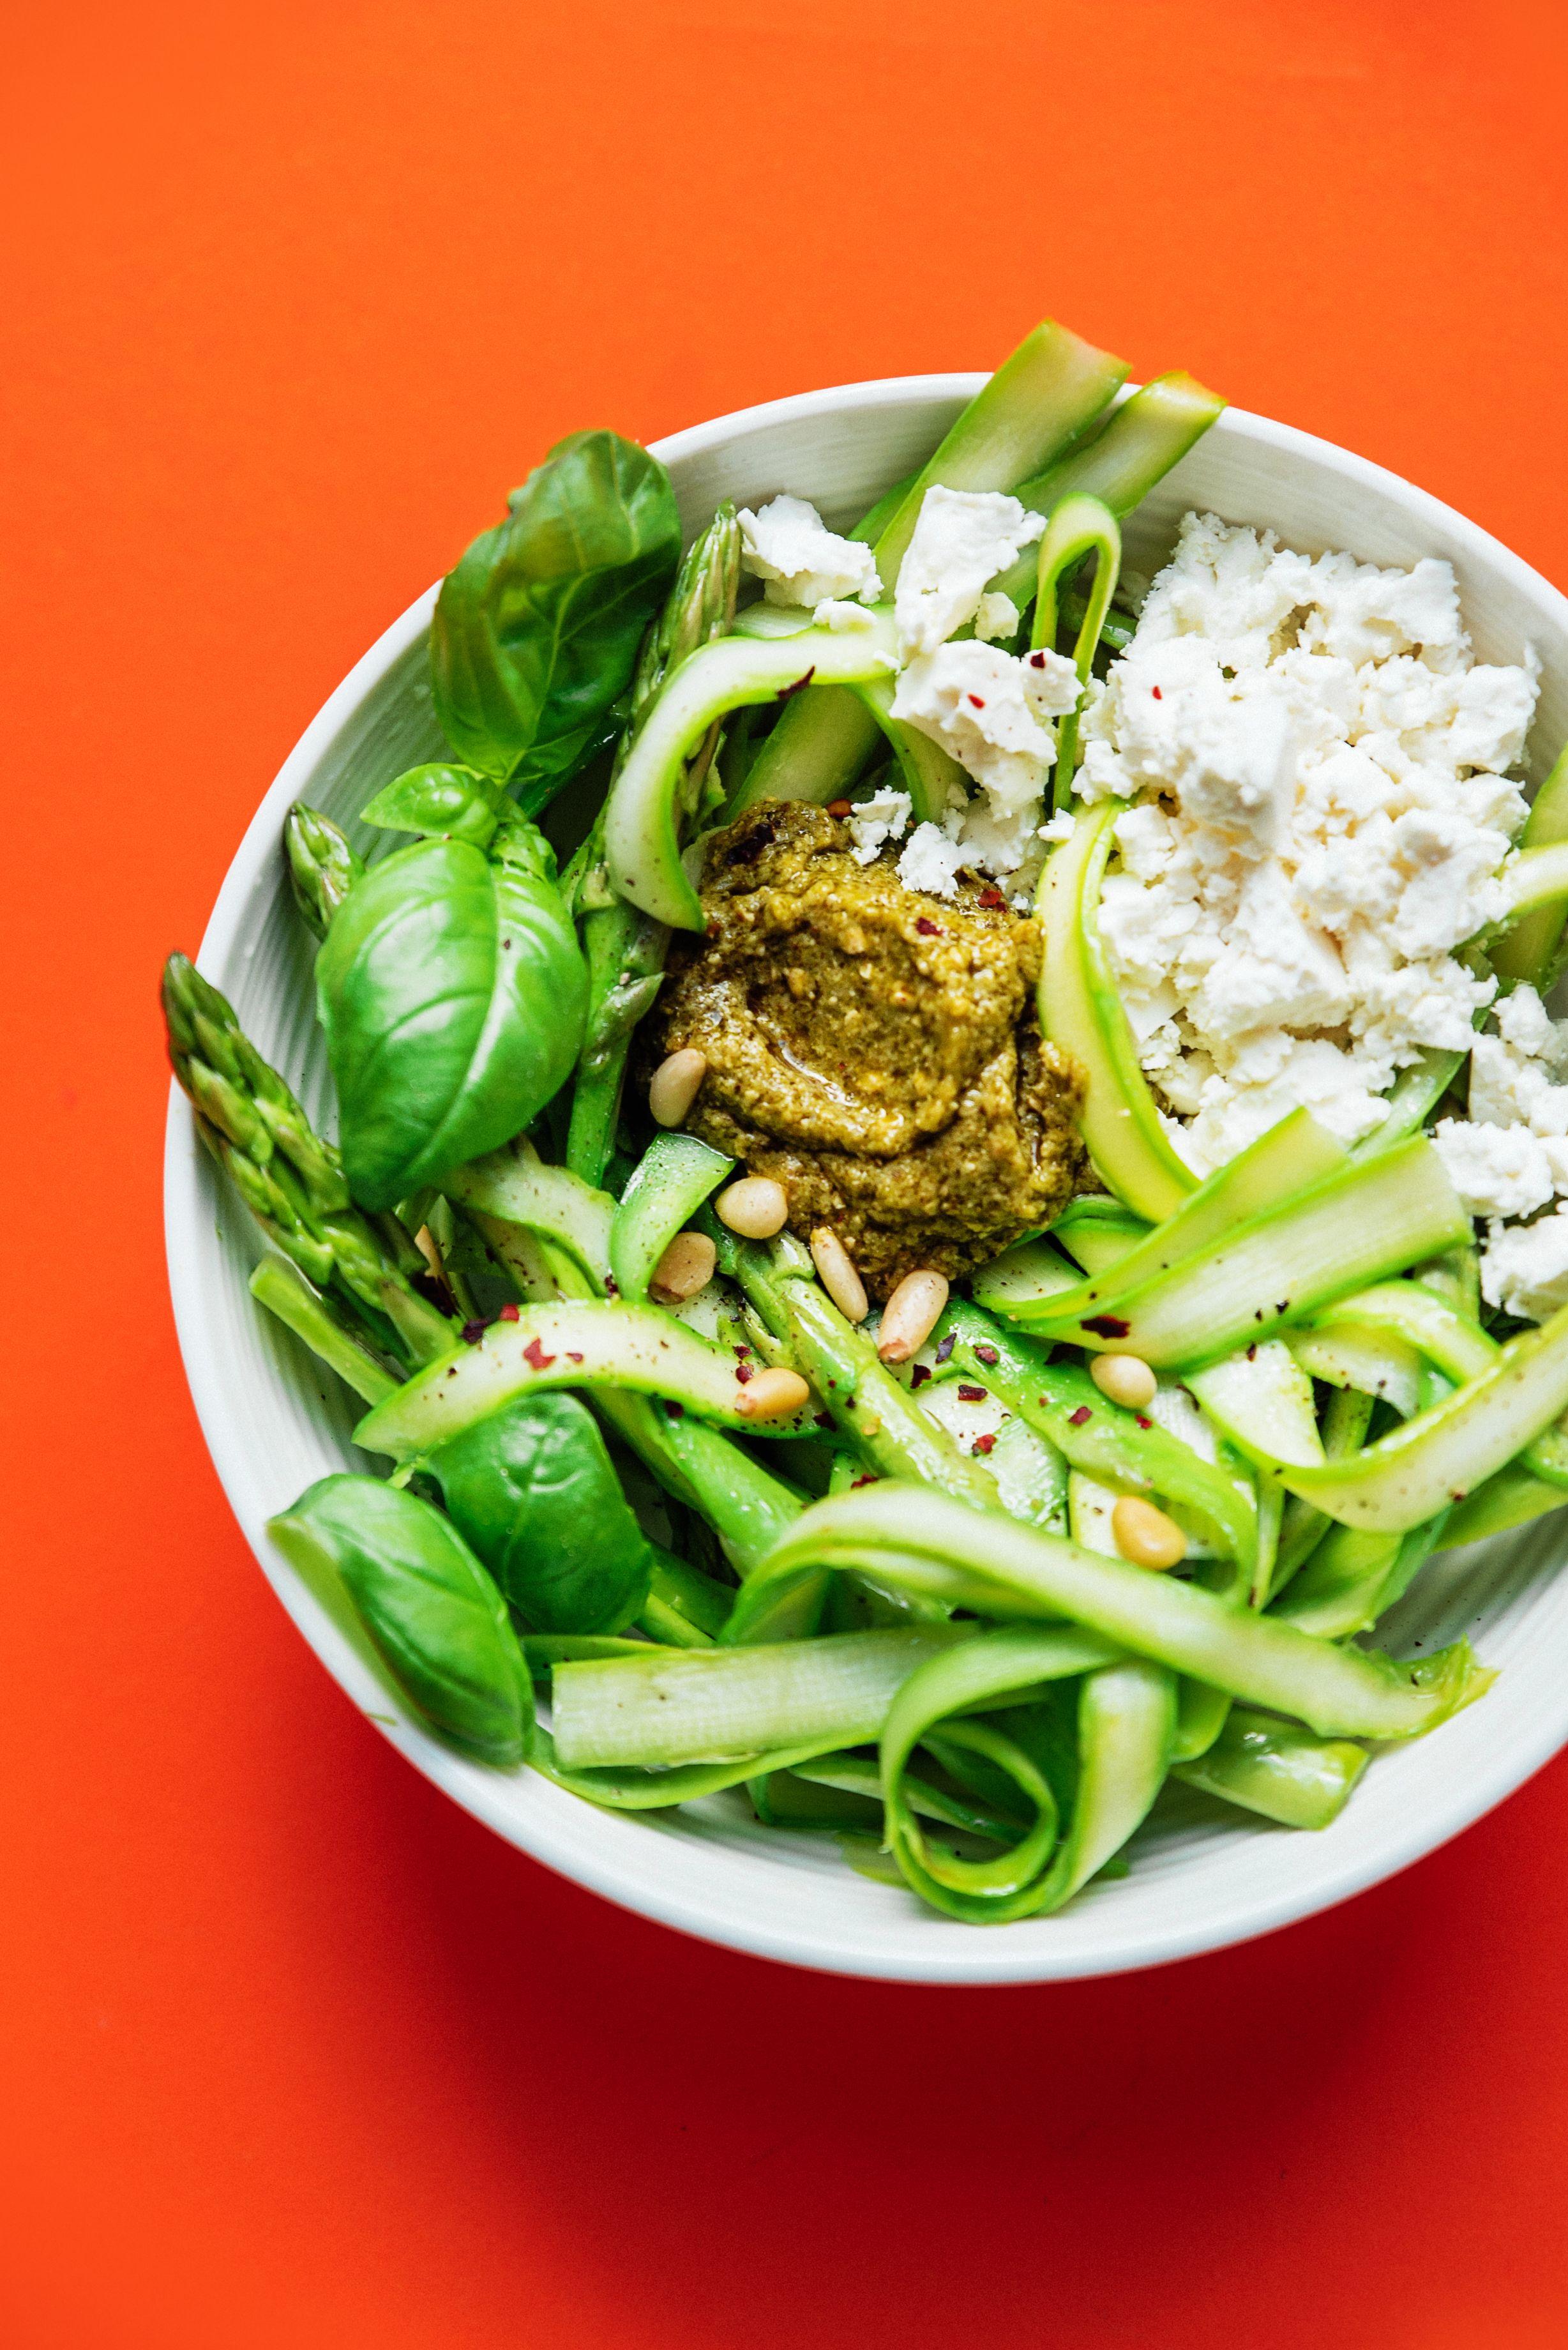 Asparagus Noodles With Pesto